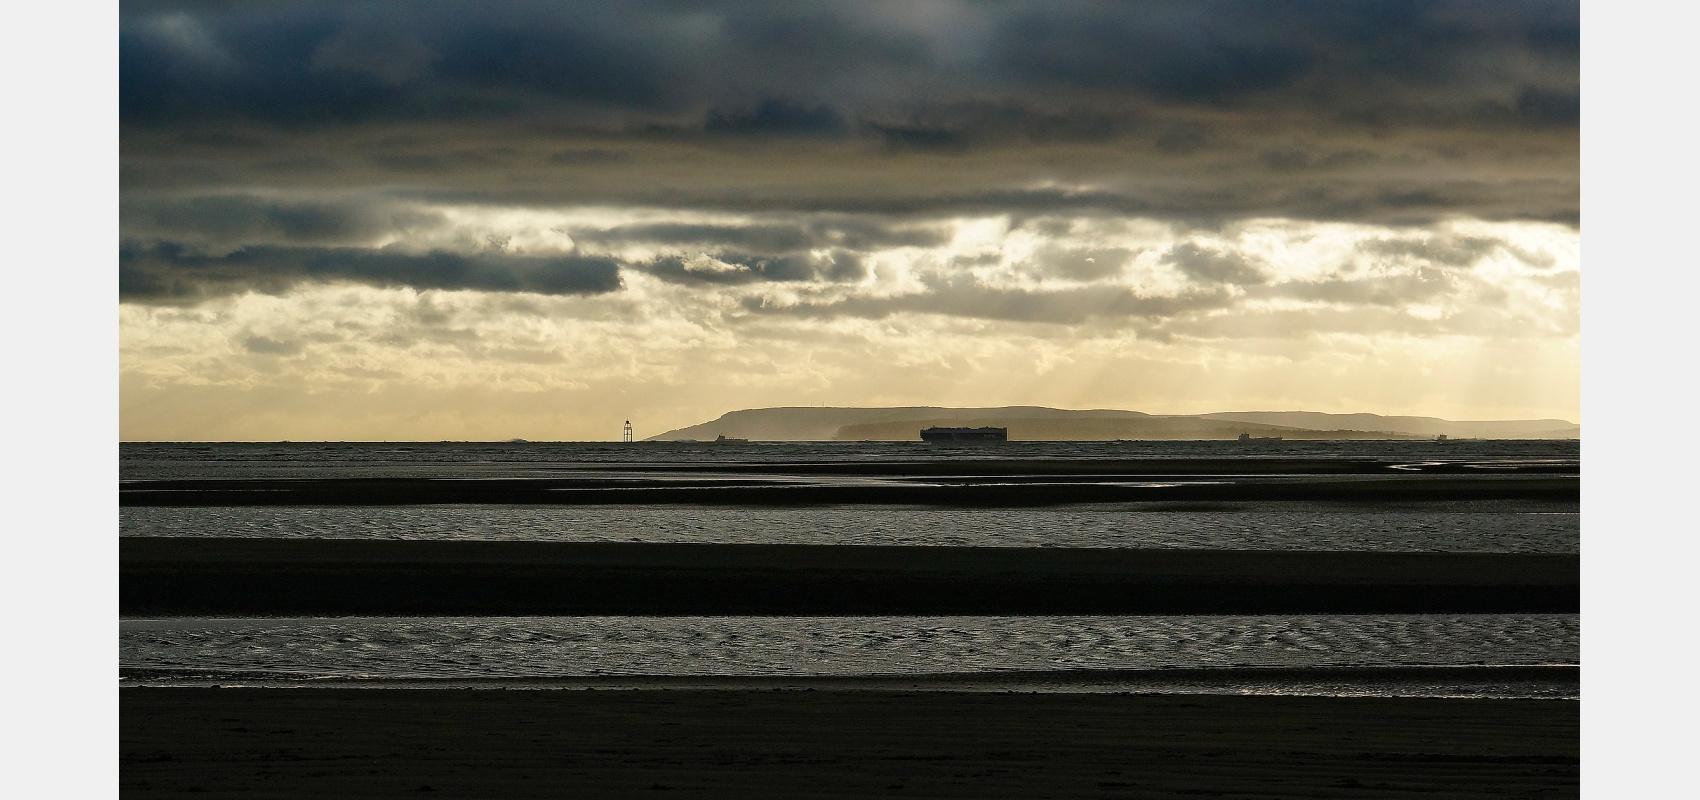 Location photography,Coastal, Ships, entering the Solent, under dark skies.